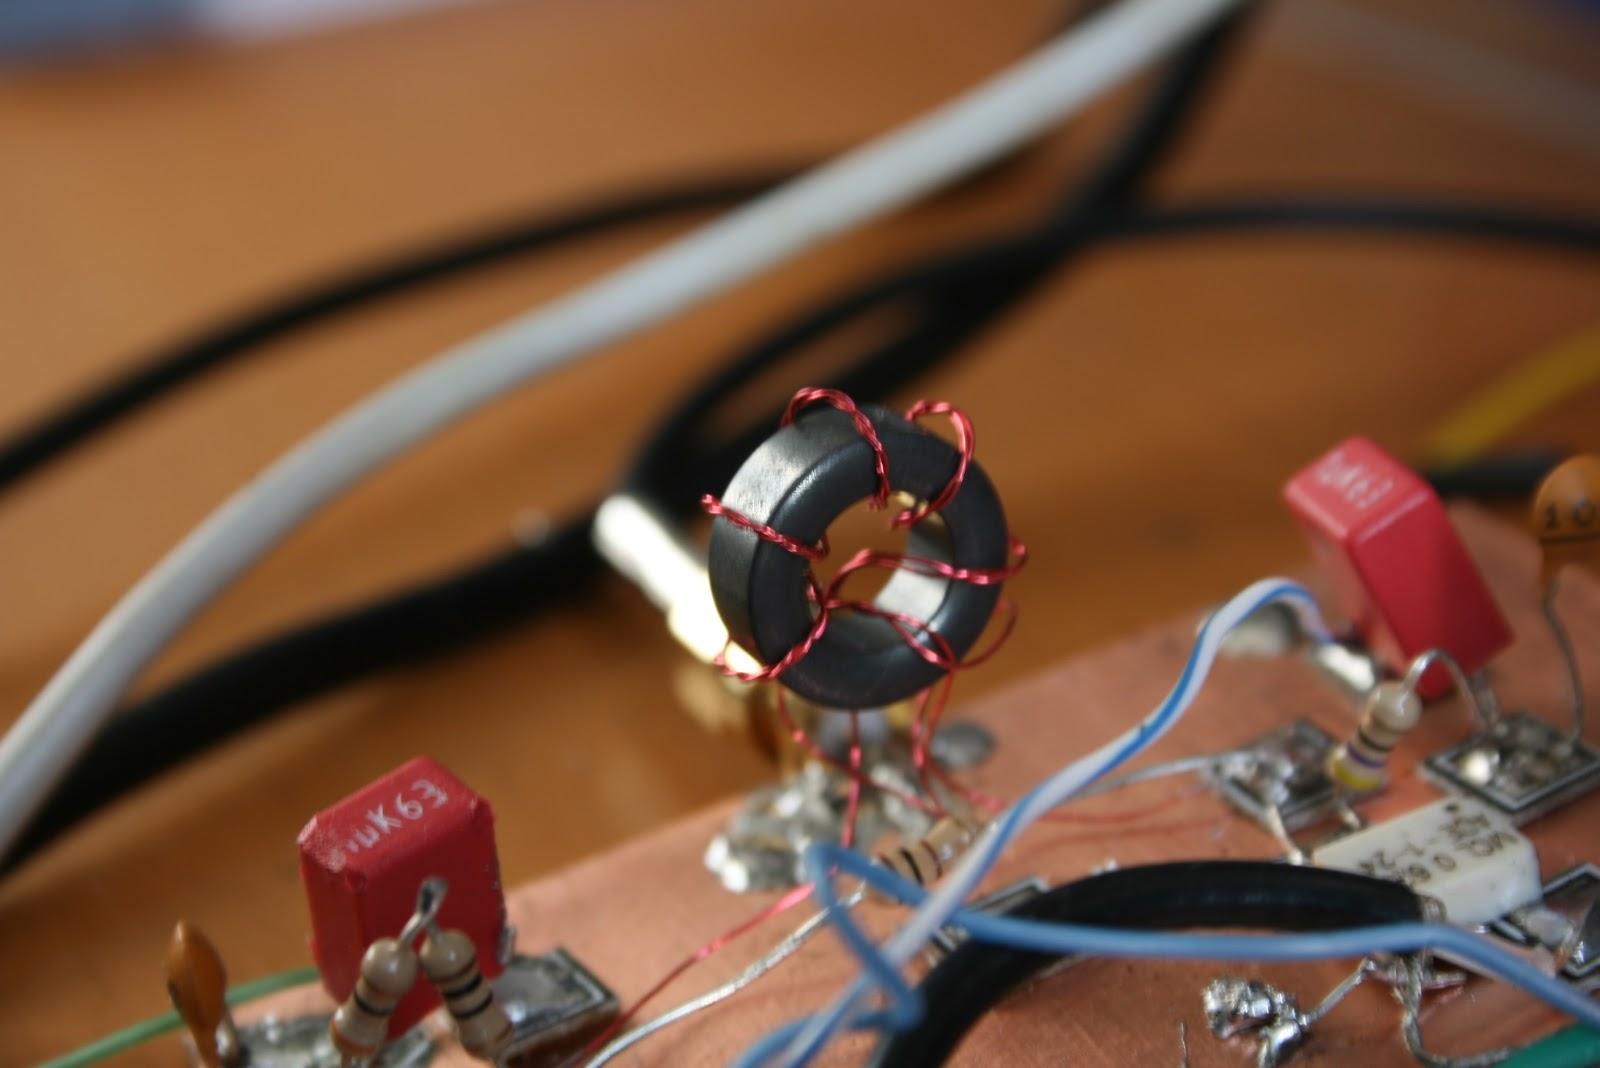 Jottings on Amateur Radio: Homebrew SDR HF Transceiver - RF Splitter